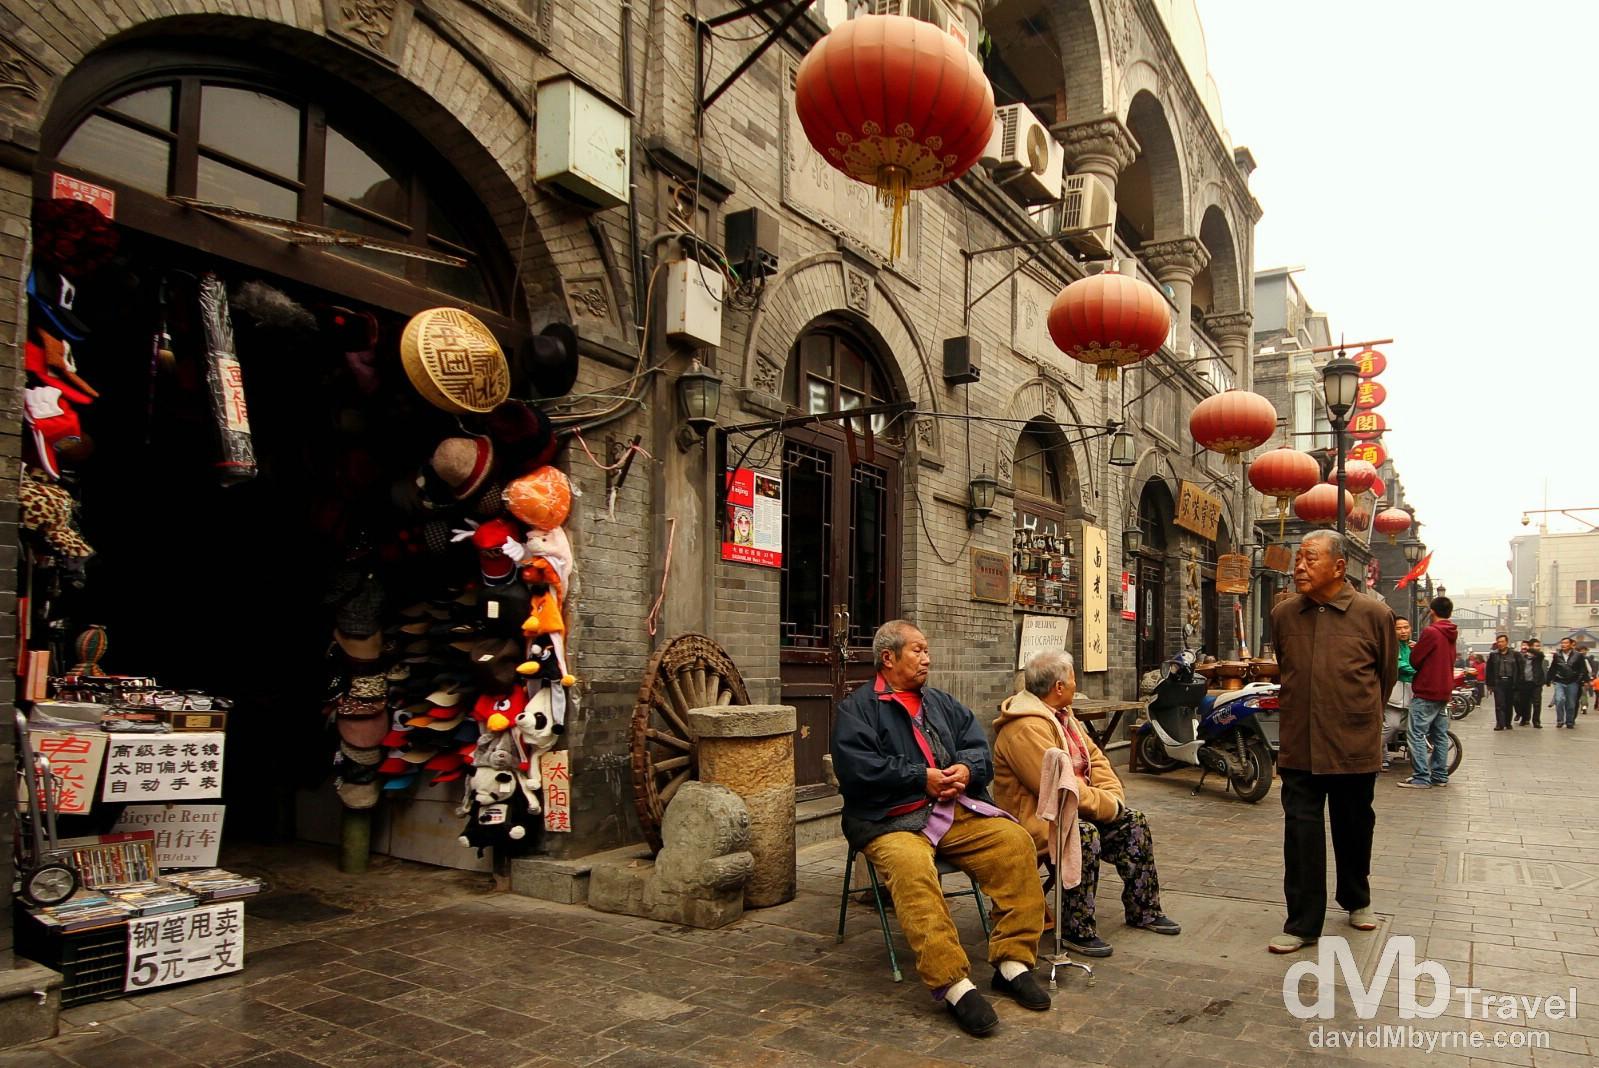 Qianmen, Beijing, China. October 26th 2012.